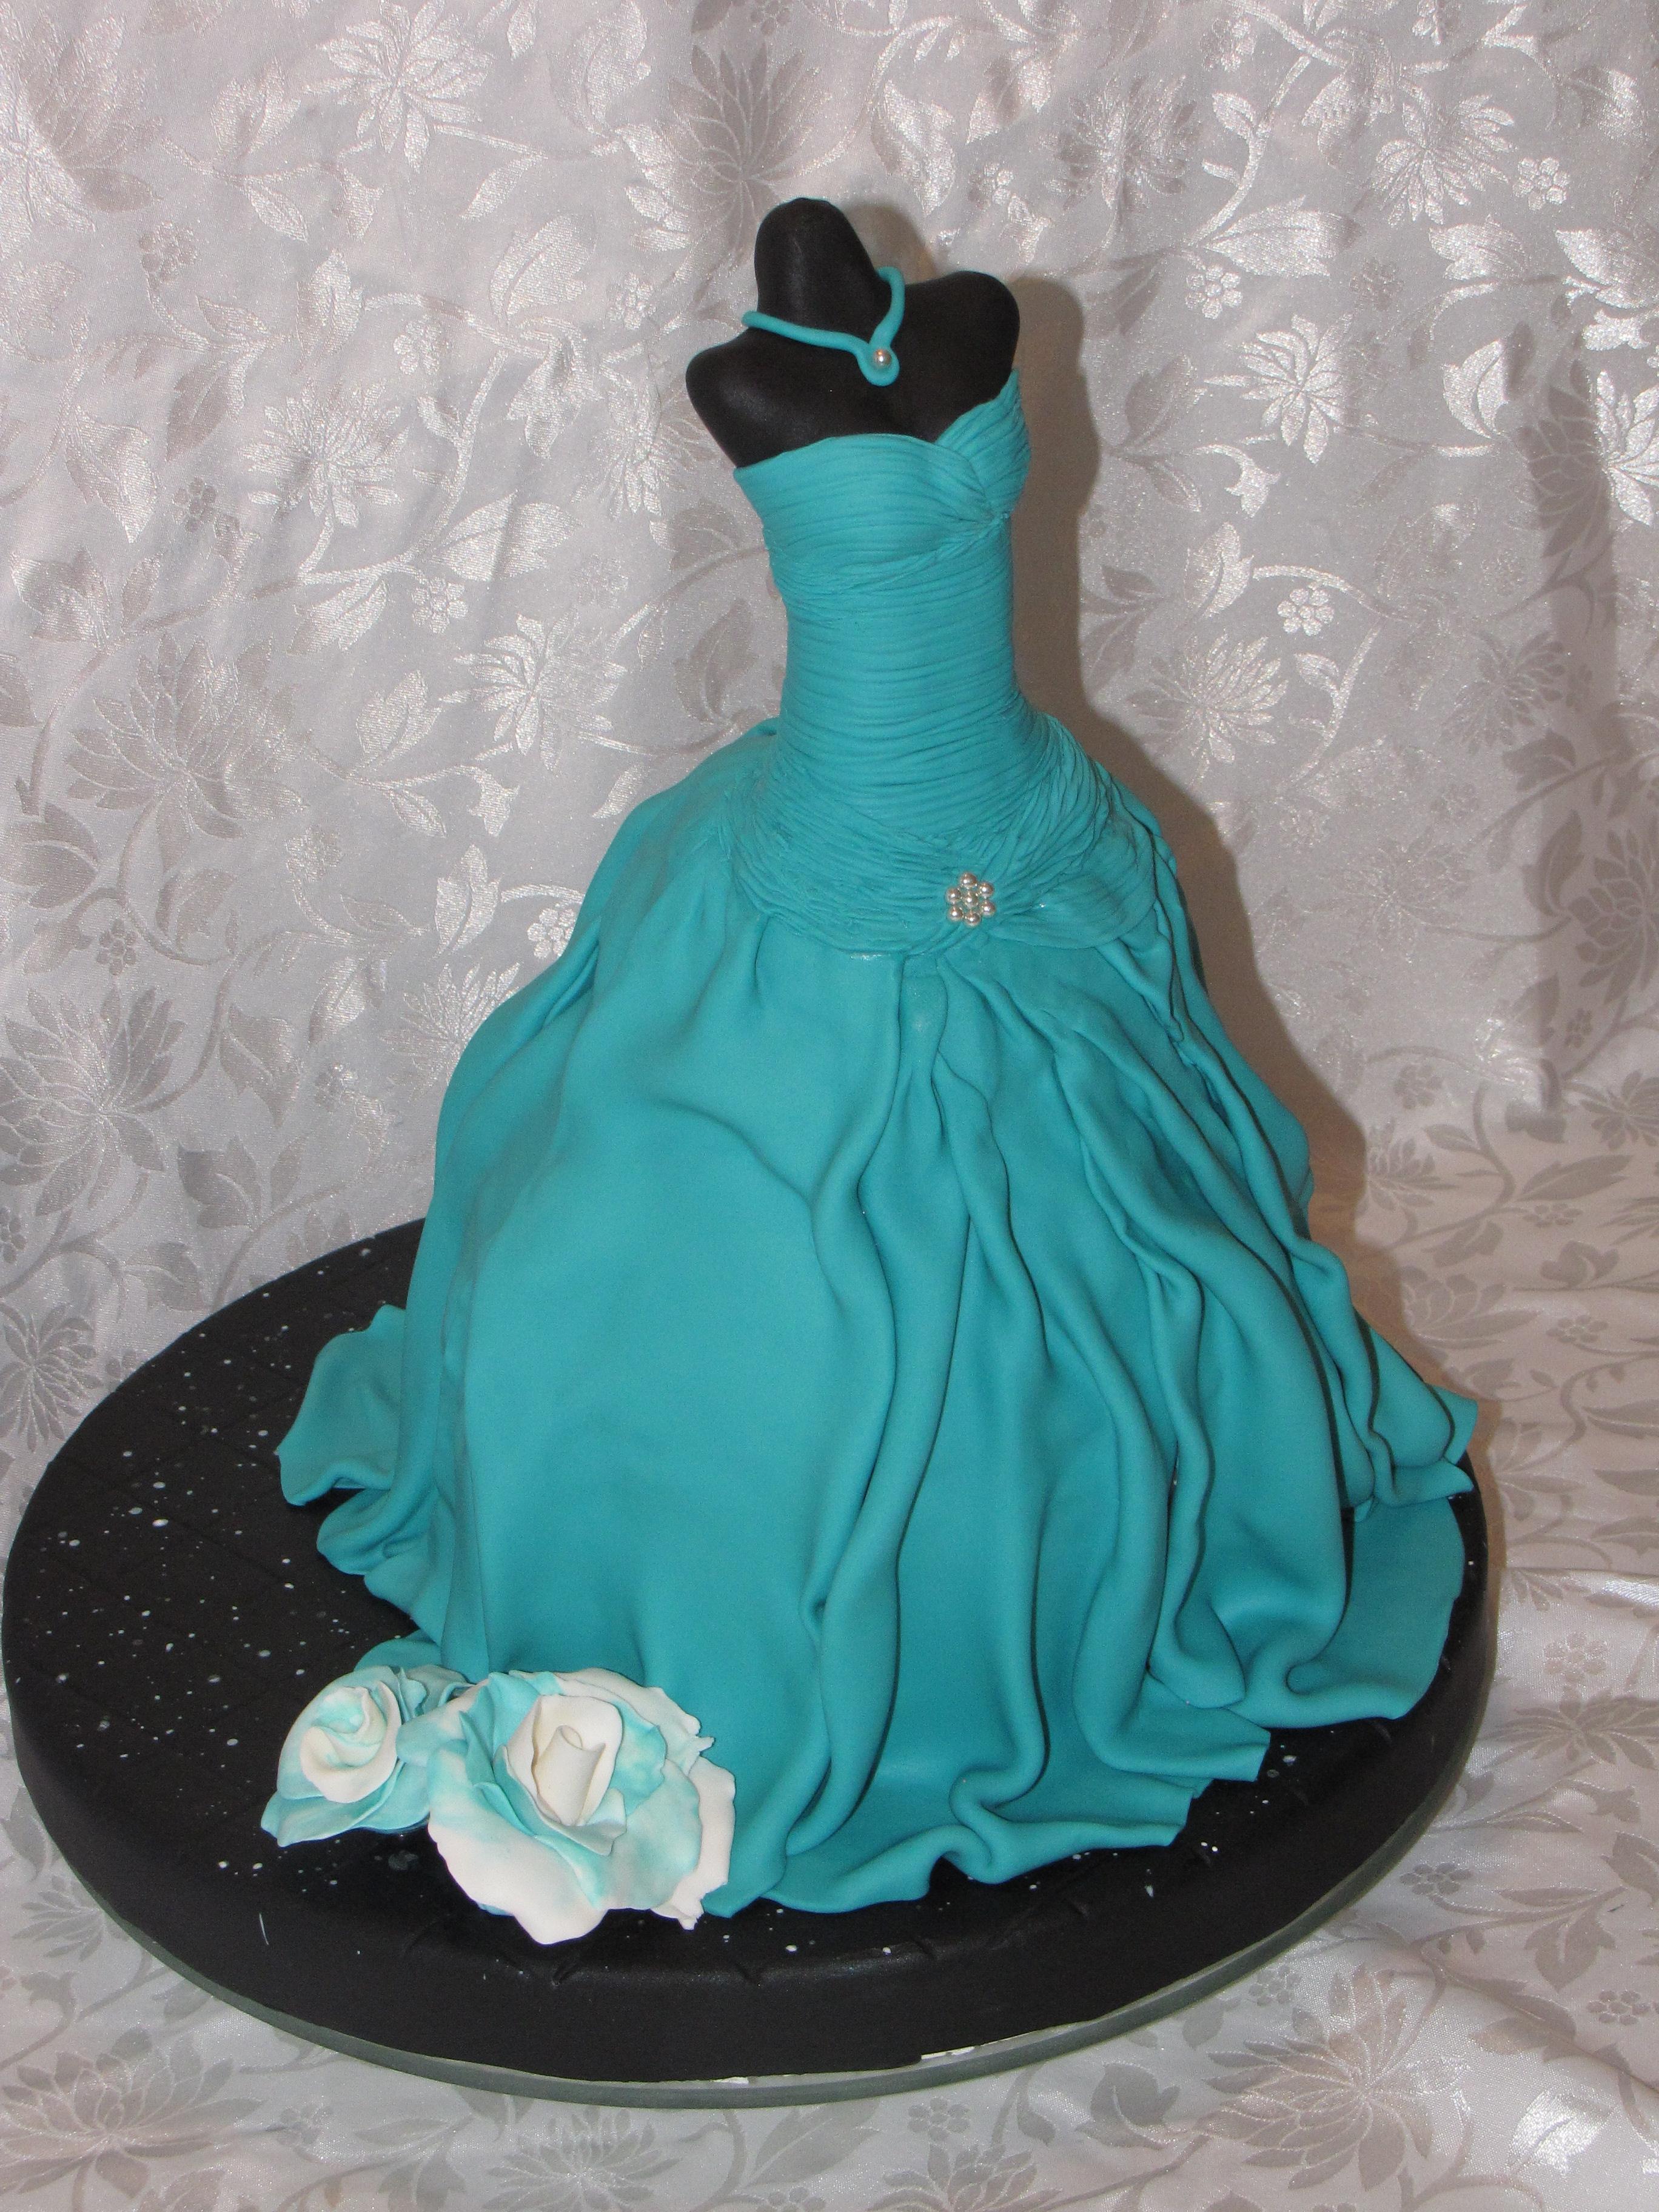 Mannequin Dress Cake Cakecentral Com